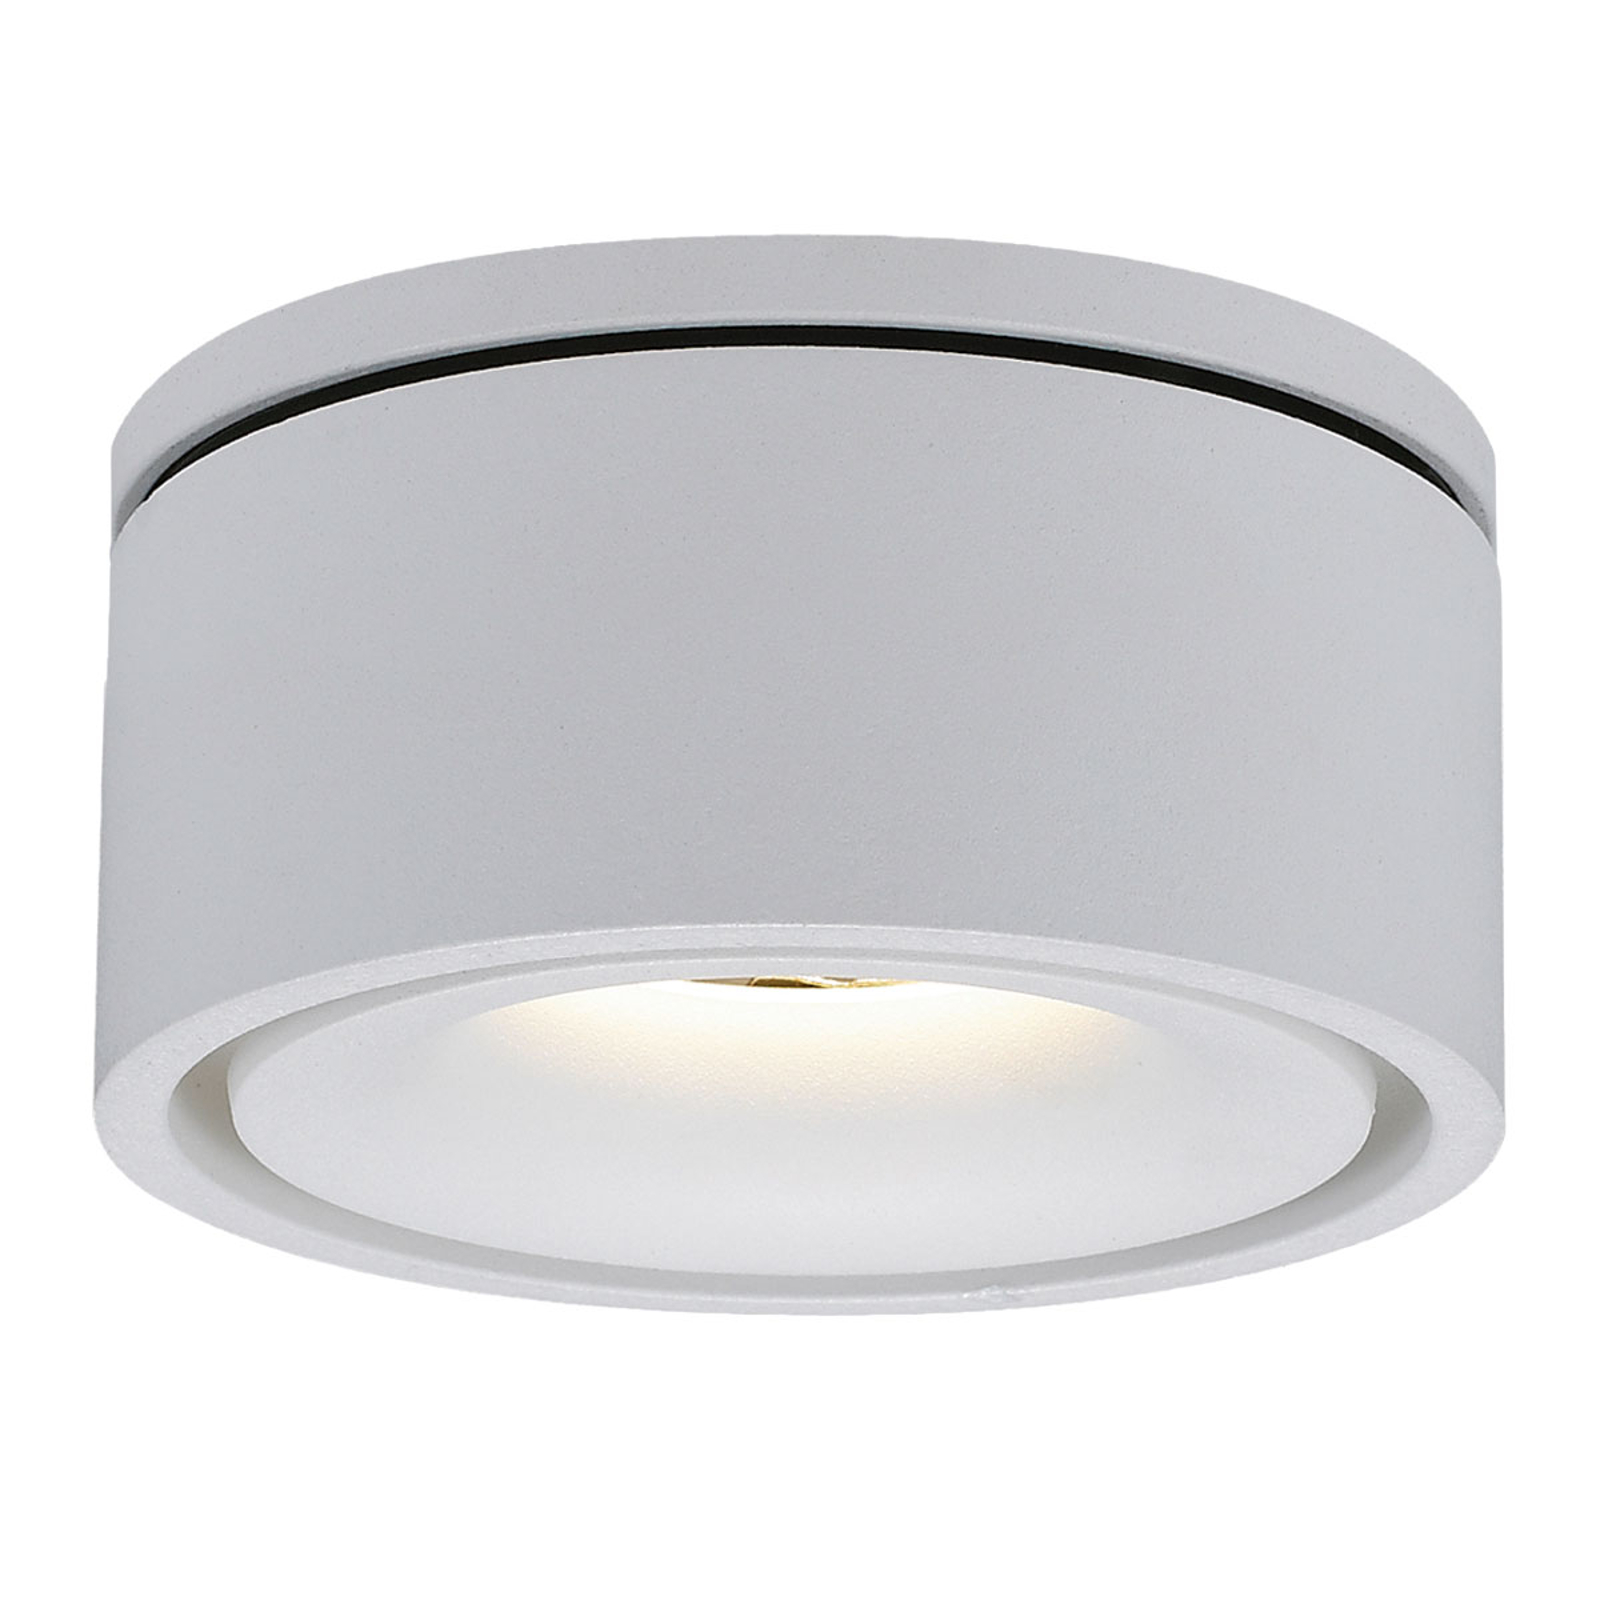 Reflektor wpuszczany LED Tivoli-E, obrotowy